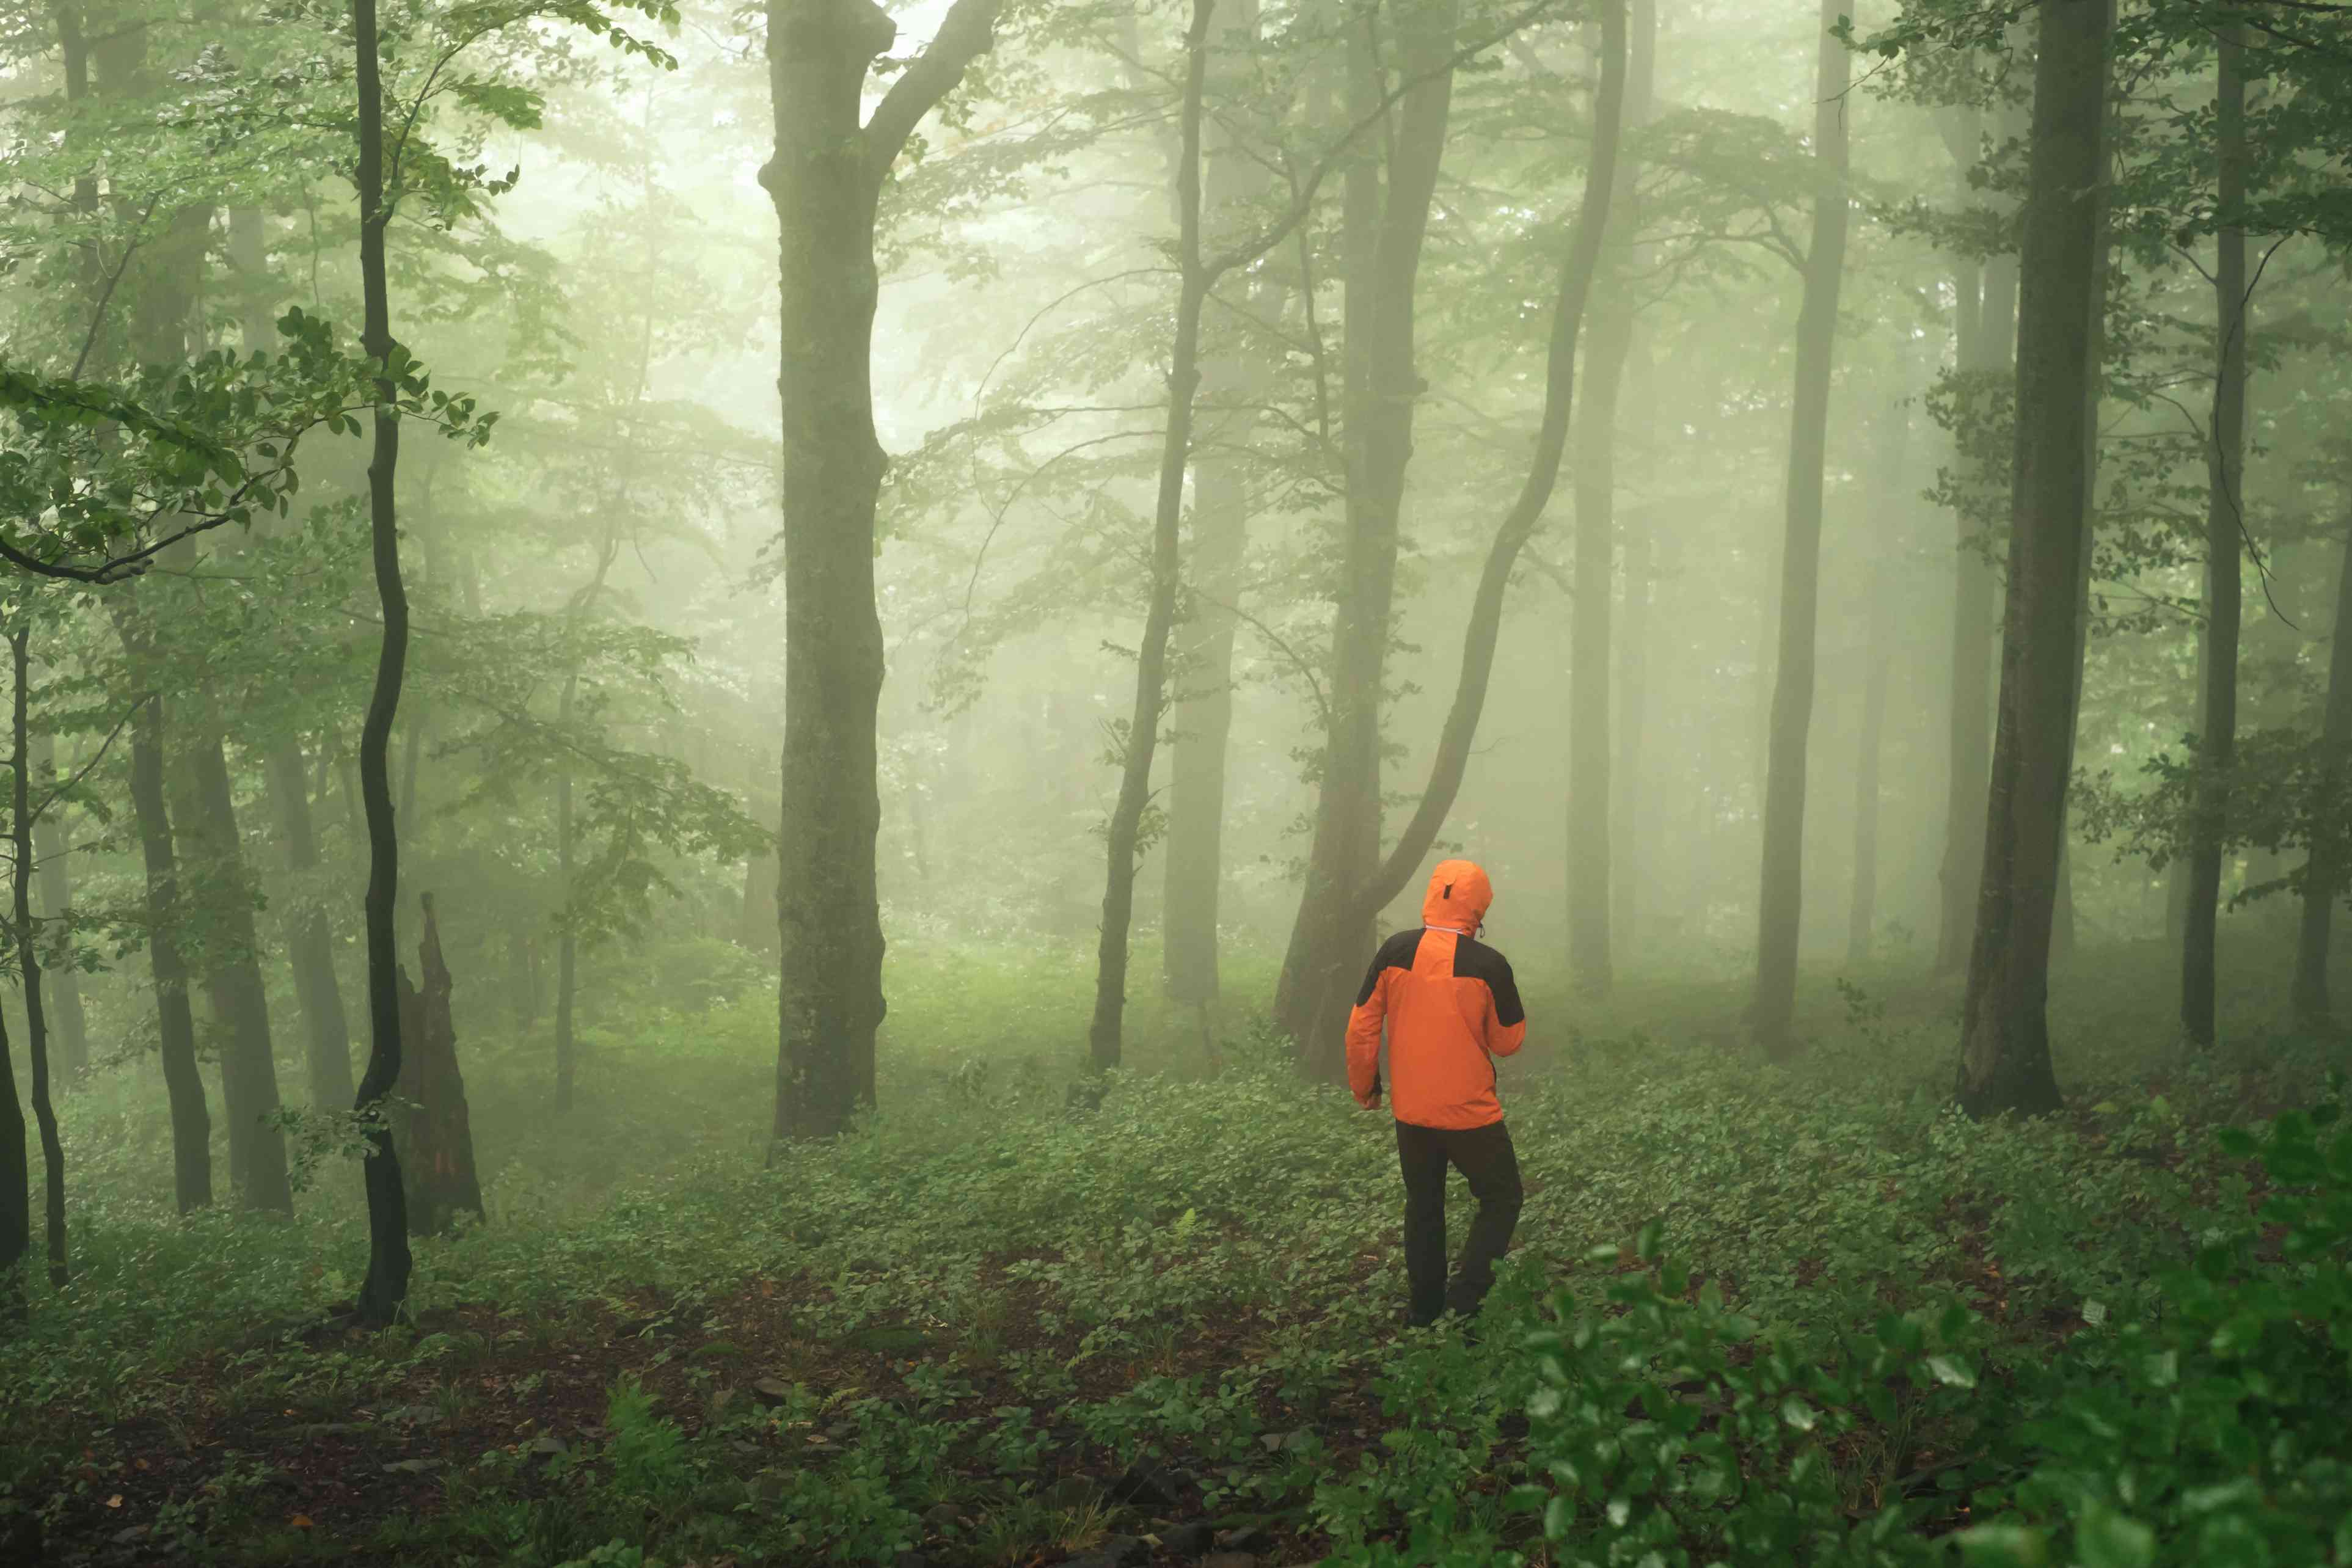 person walking through a foggy forest